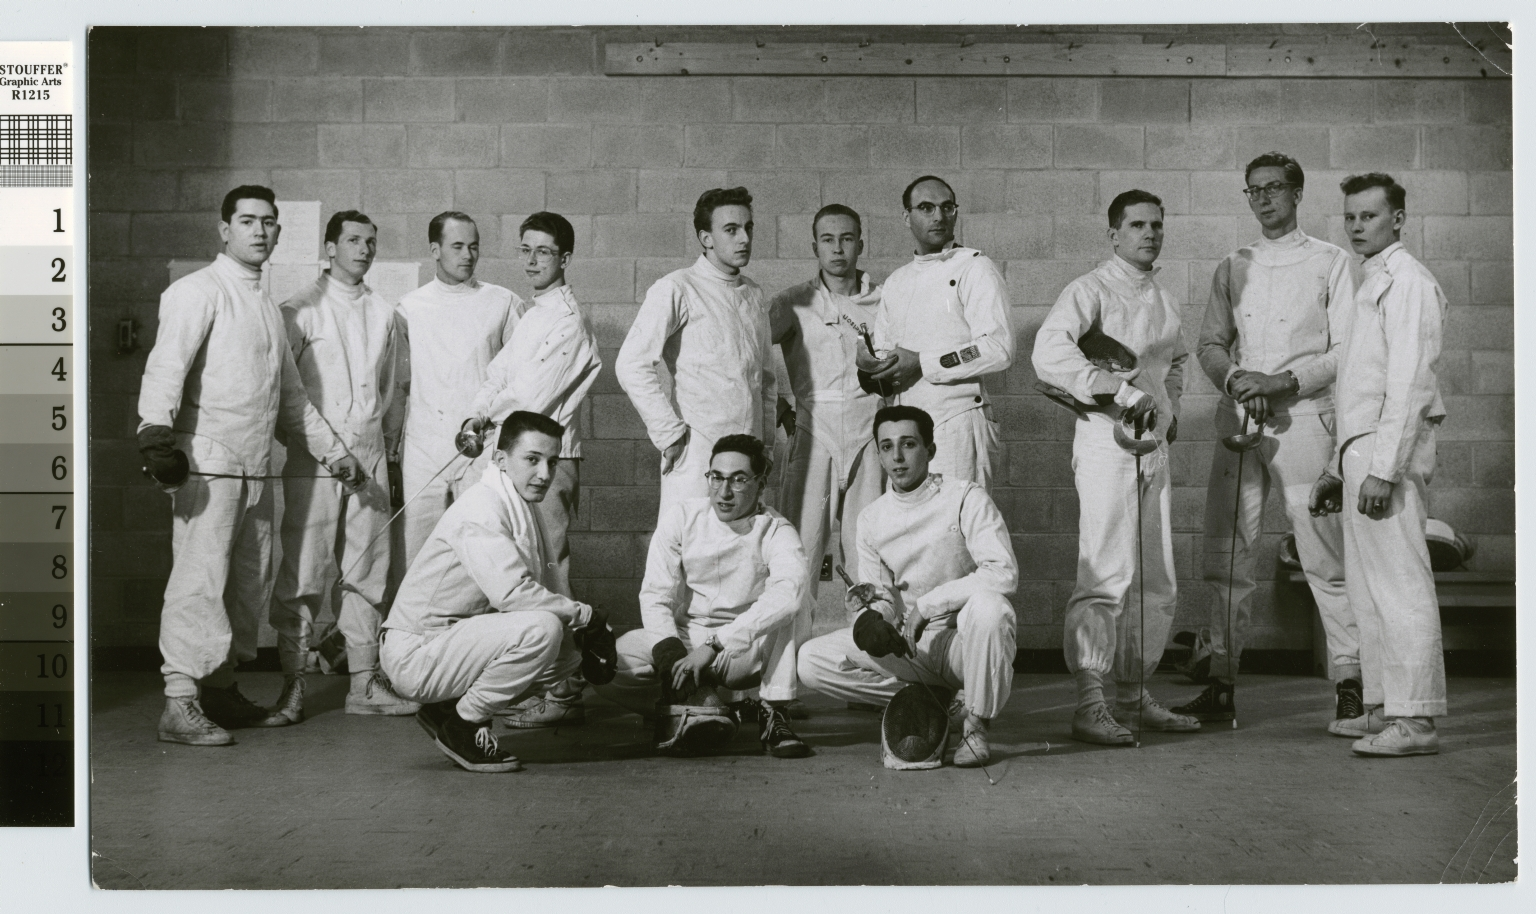 Student activities, group portrait of the RIT men's fencing team. 1956